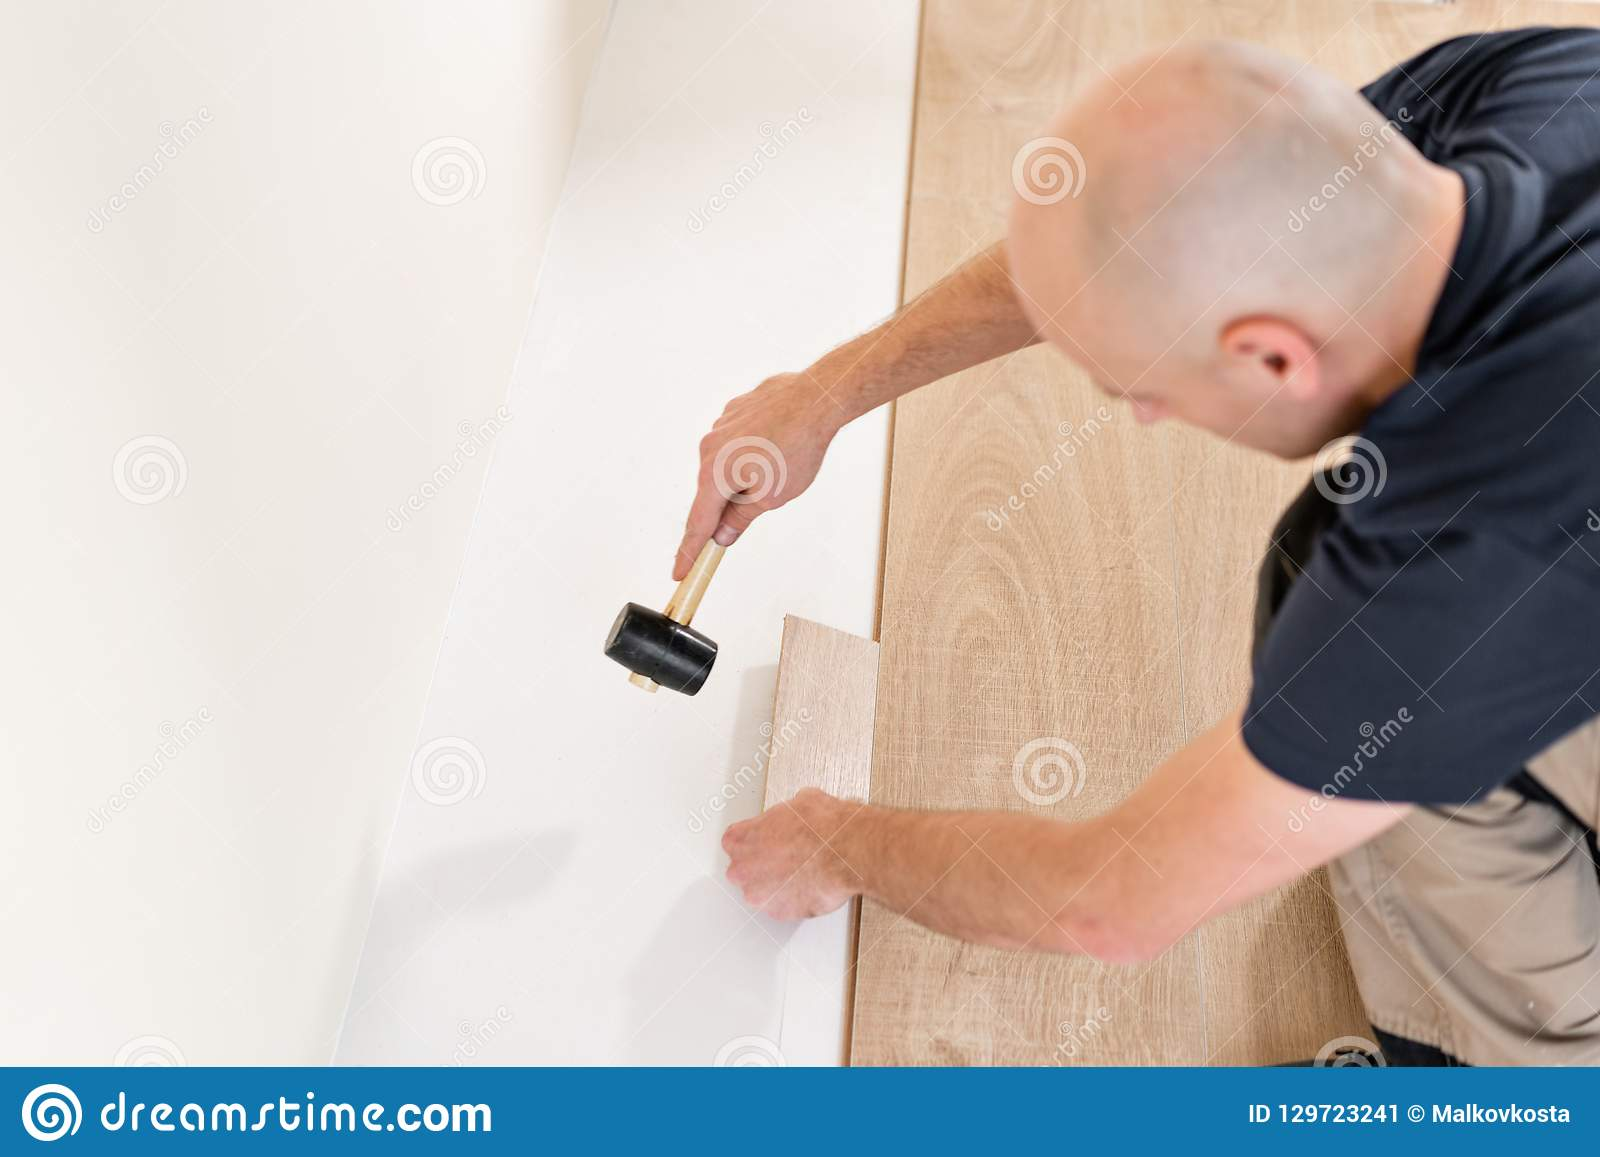 Male worker installing new wooden laminate flooring on a warm film foil floor. infrared floor heating system under